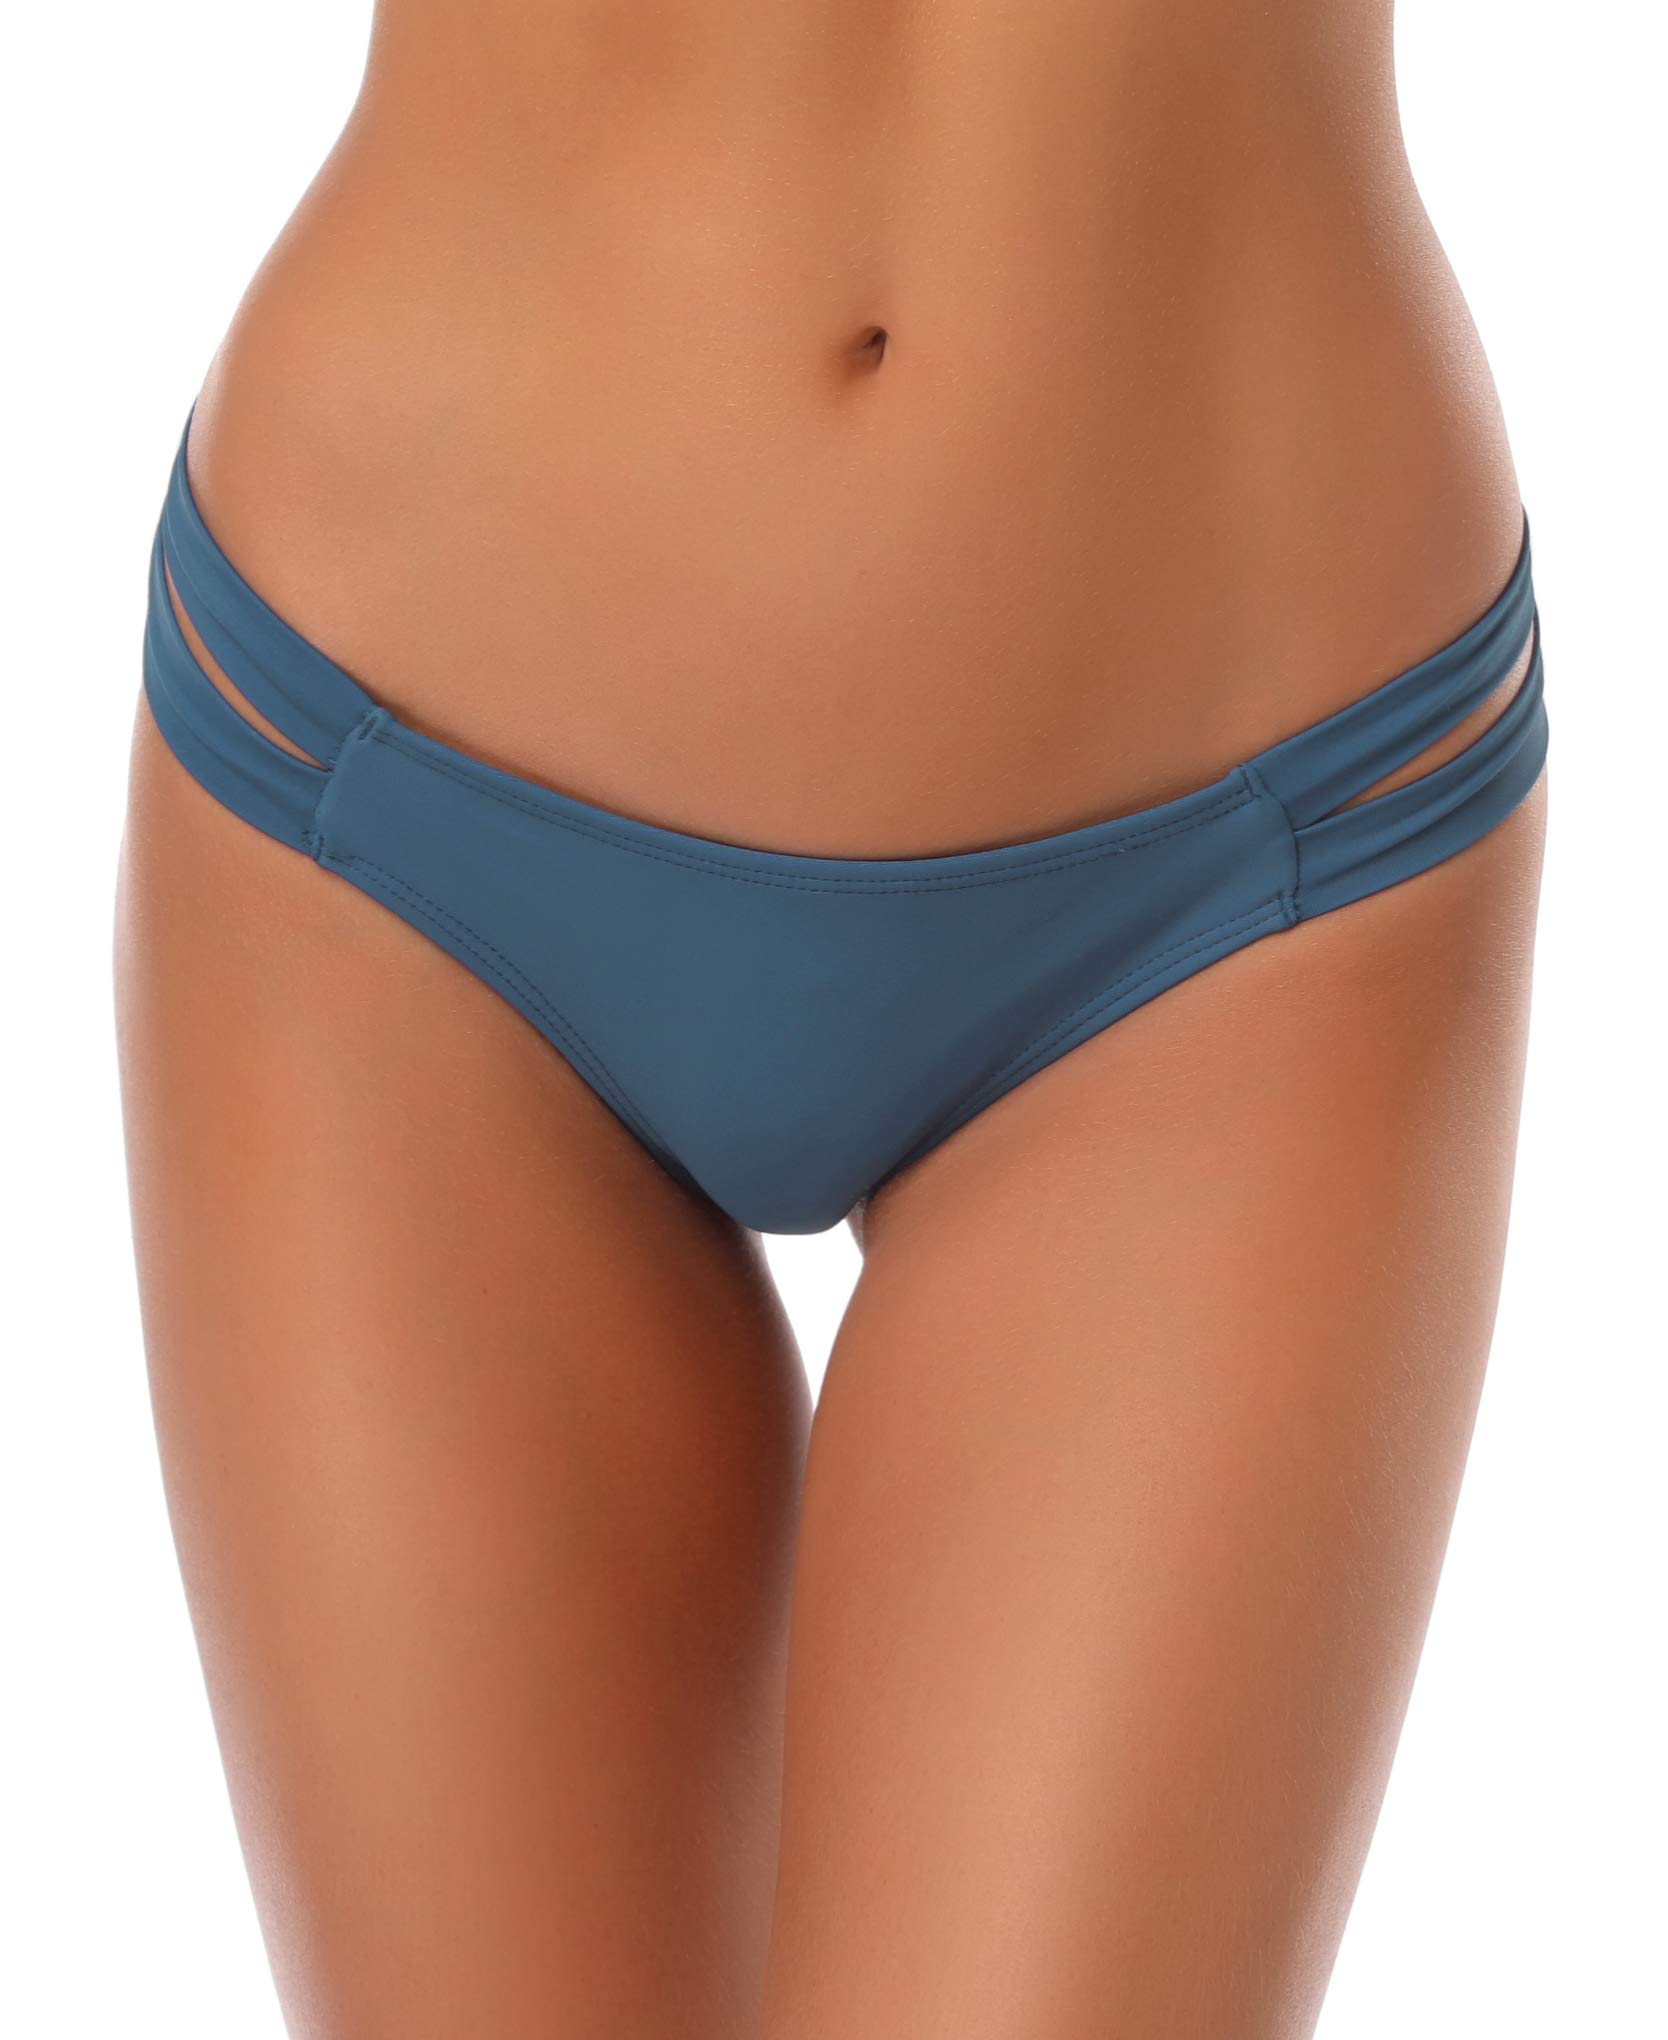 SHEKINI Cheeky Bikini Bottoms Strappy Low Rise Brazilian Thong Swim Shorts Women (Small/(US 4-6), Airy Blue)